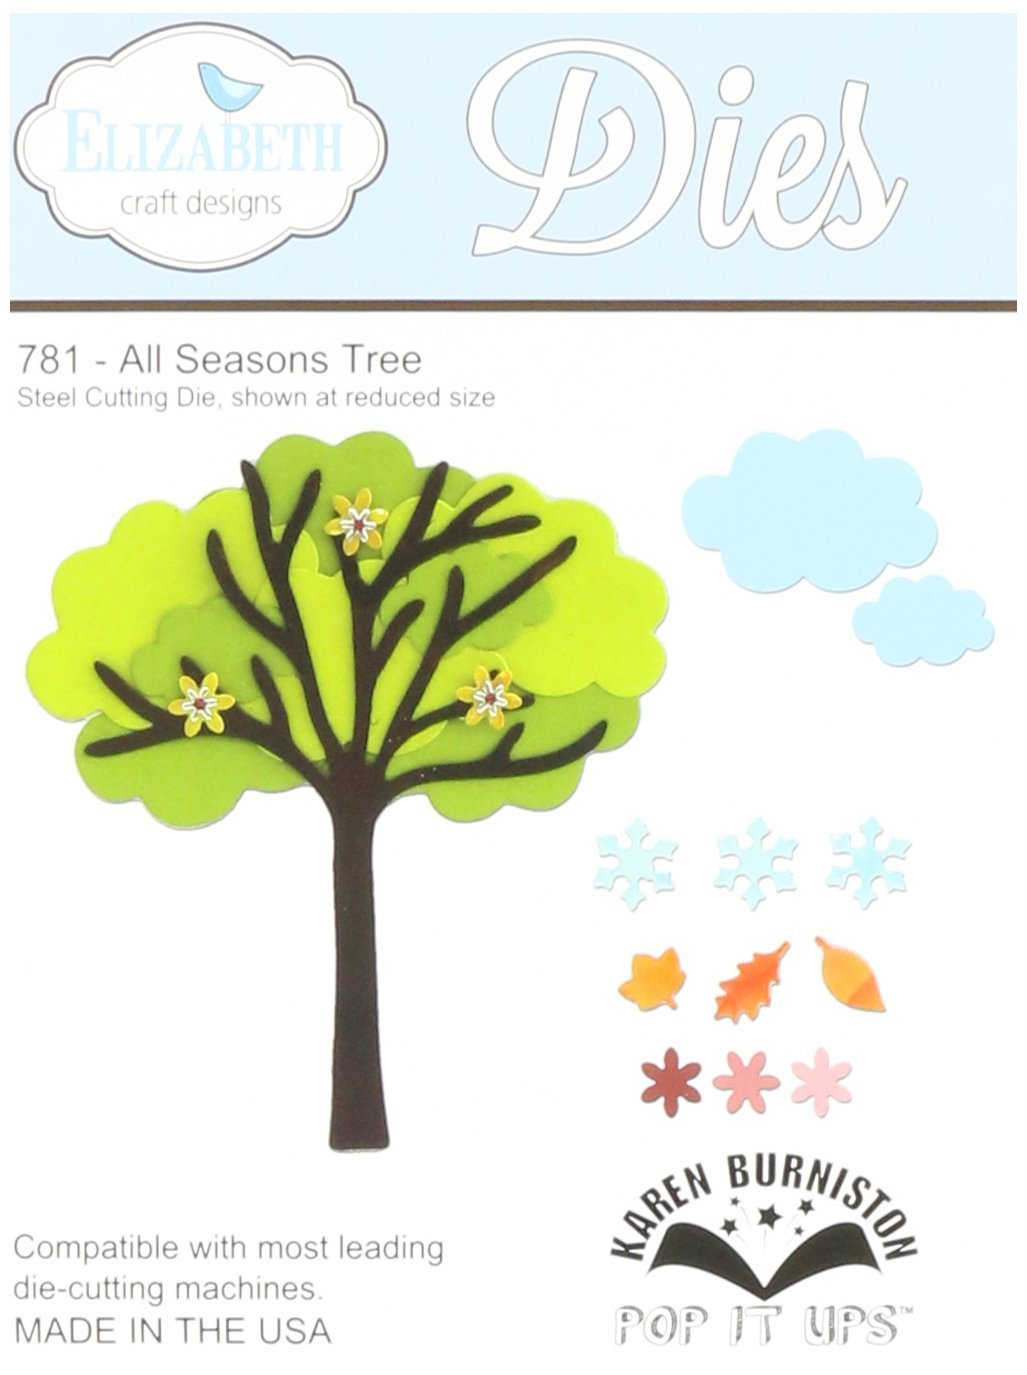 Elizabeth Craft Pop It Up Metal Dies By Karen Burniston-All Season Tree (並行輸入品) B00IXWKZ2A